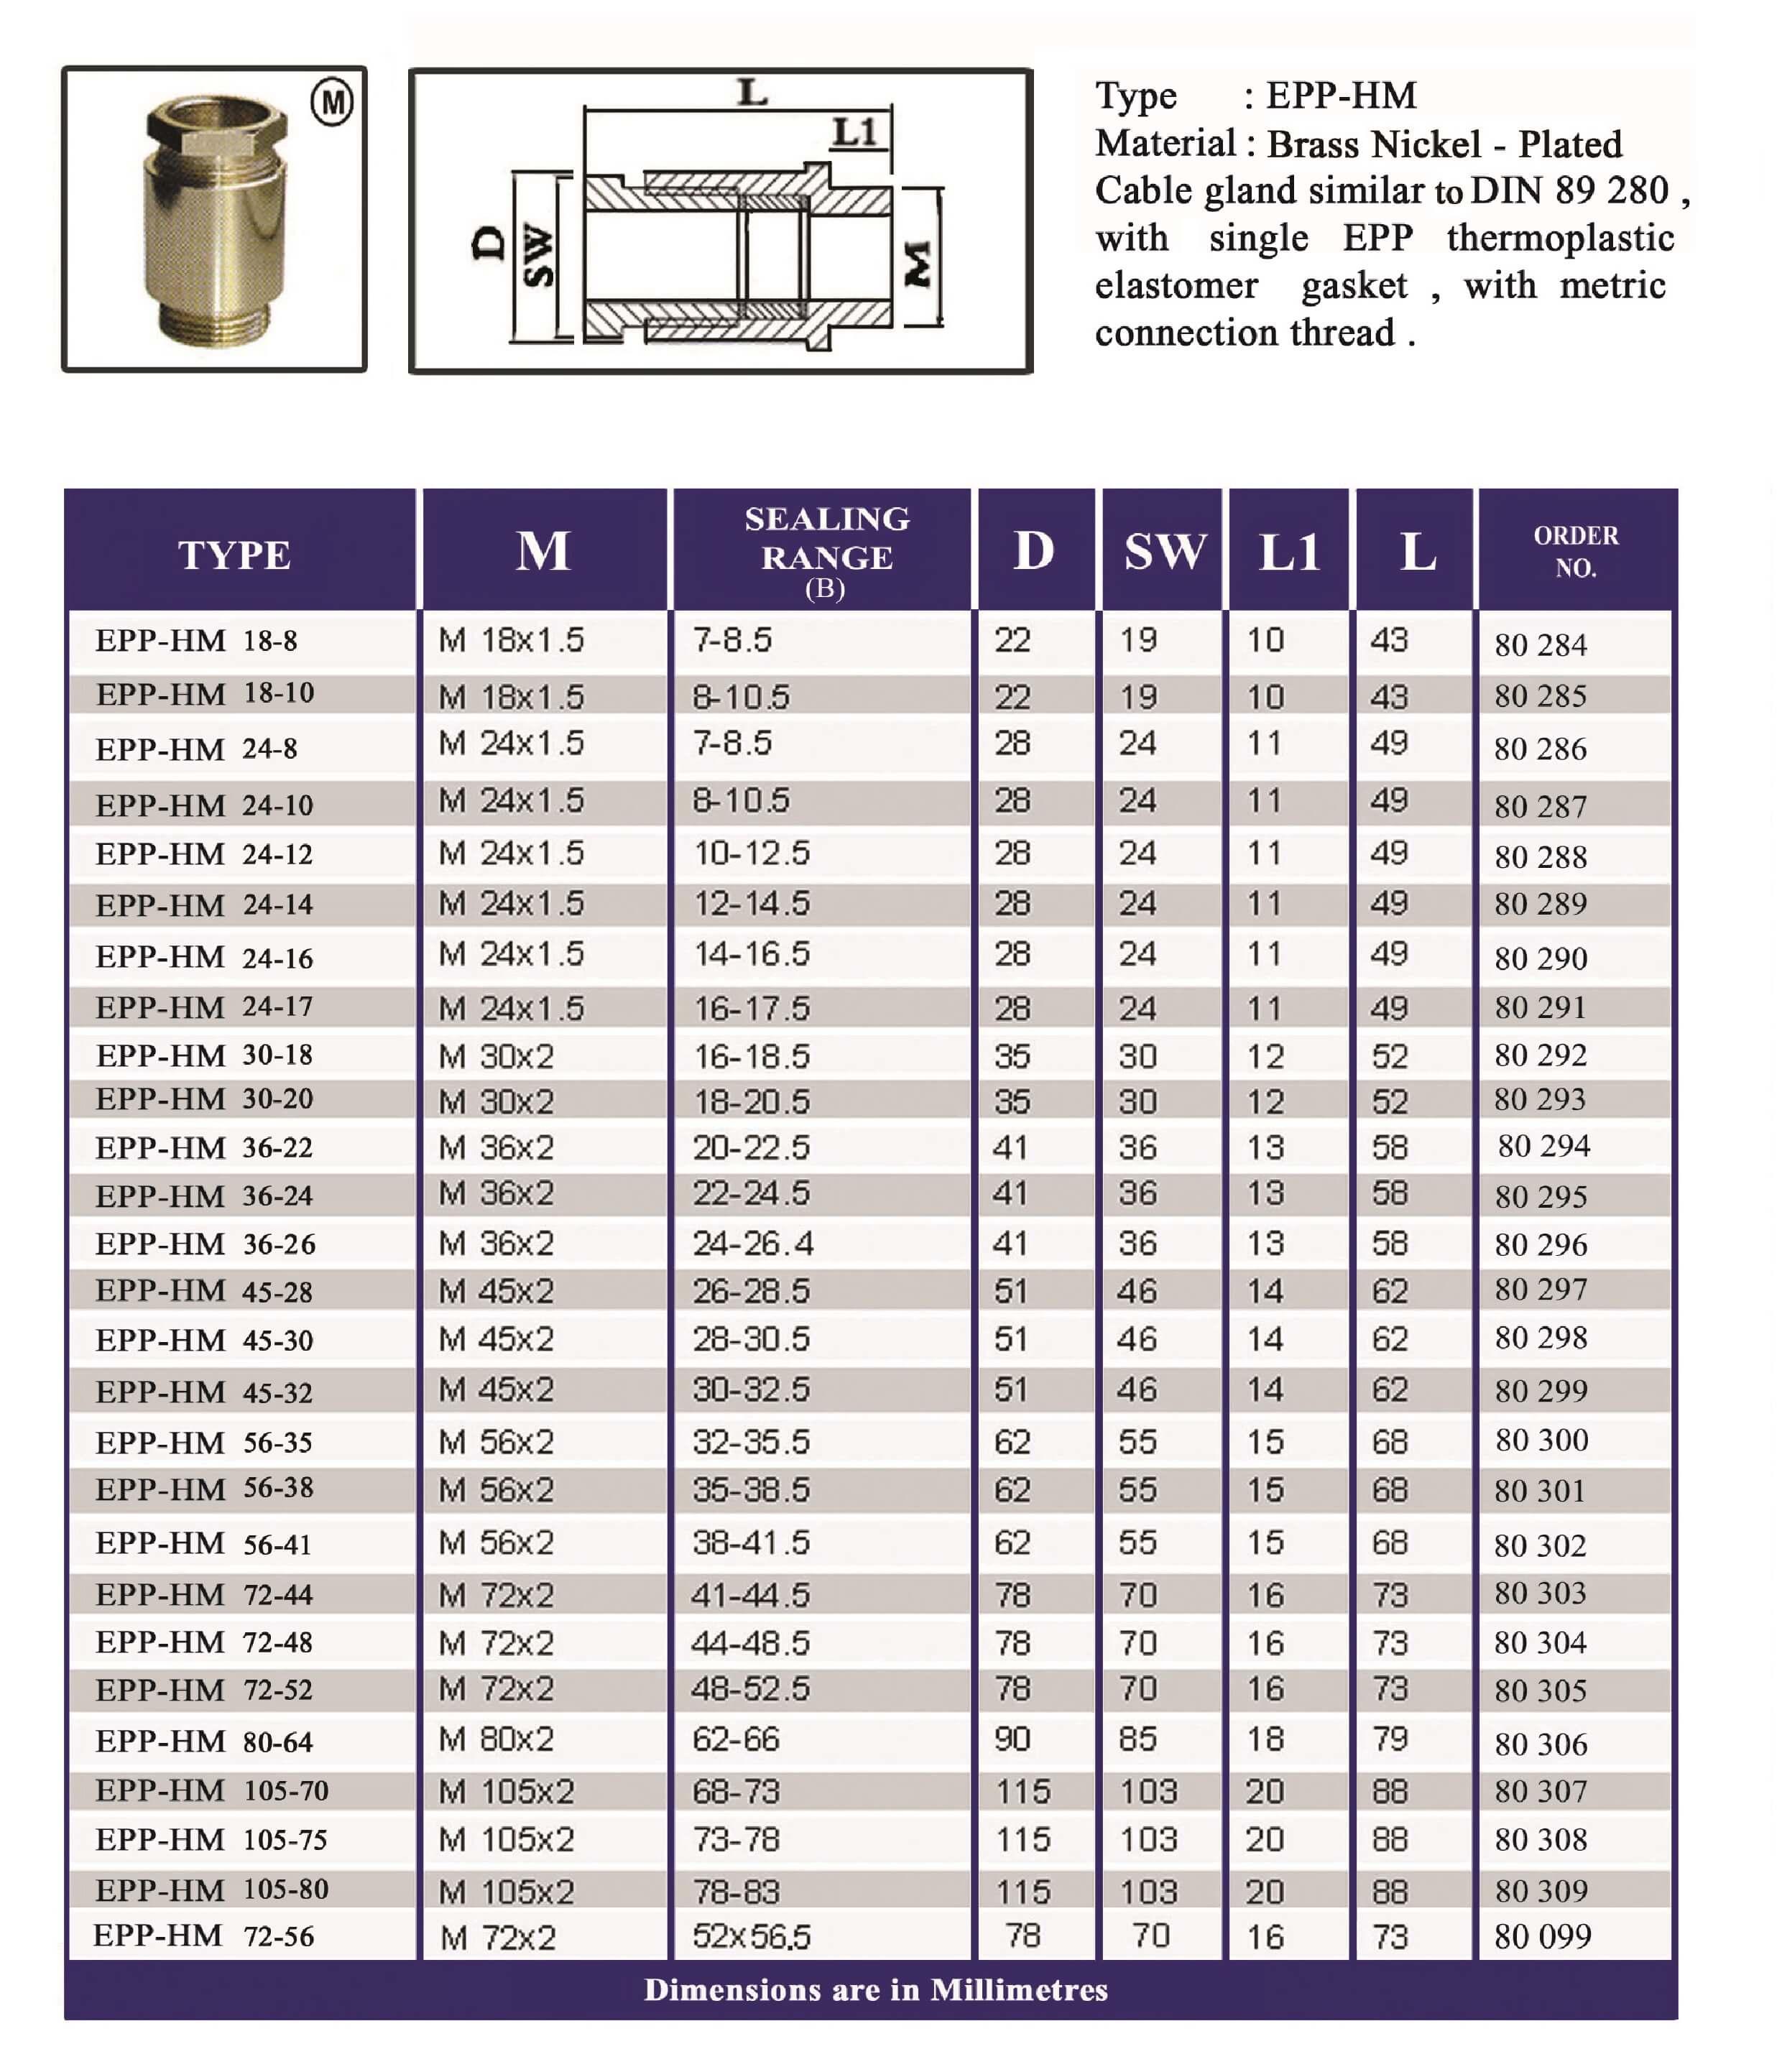 E.P.P - HM Technical Datasheet